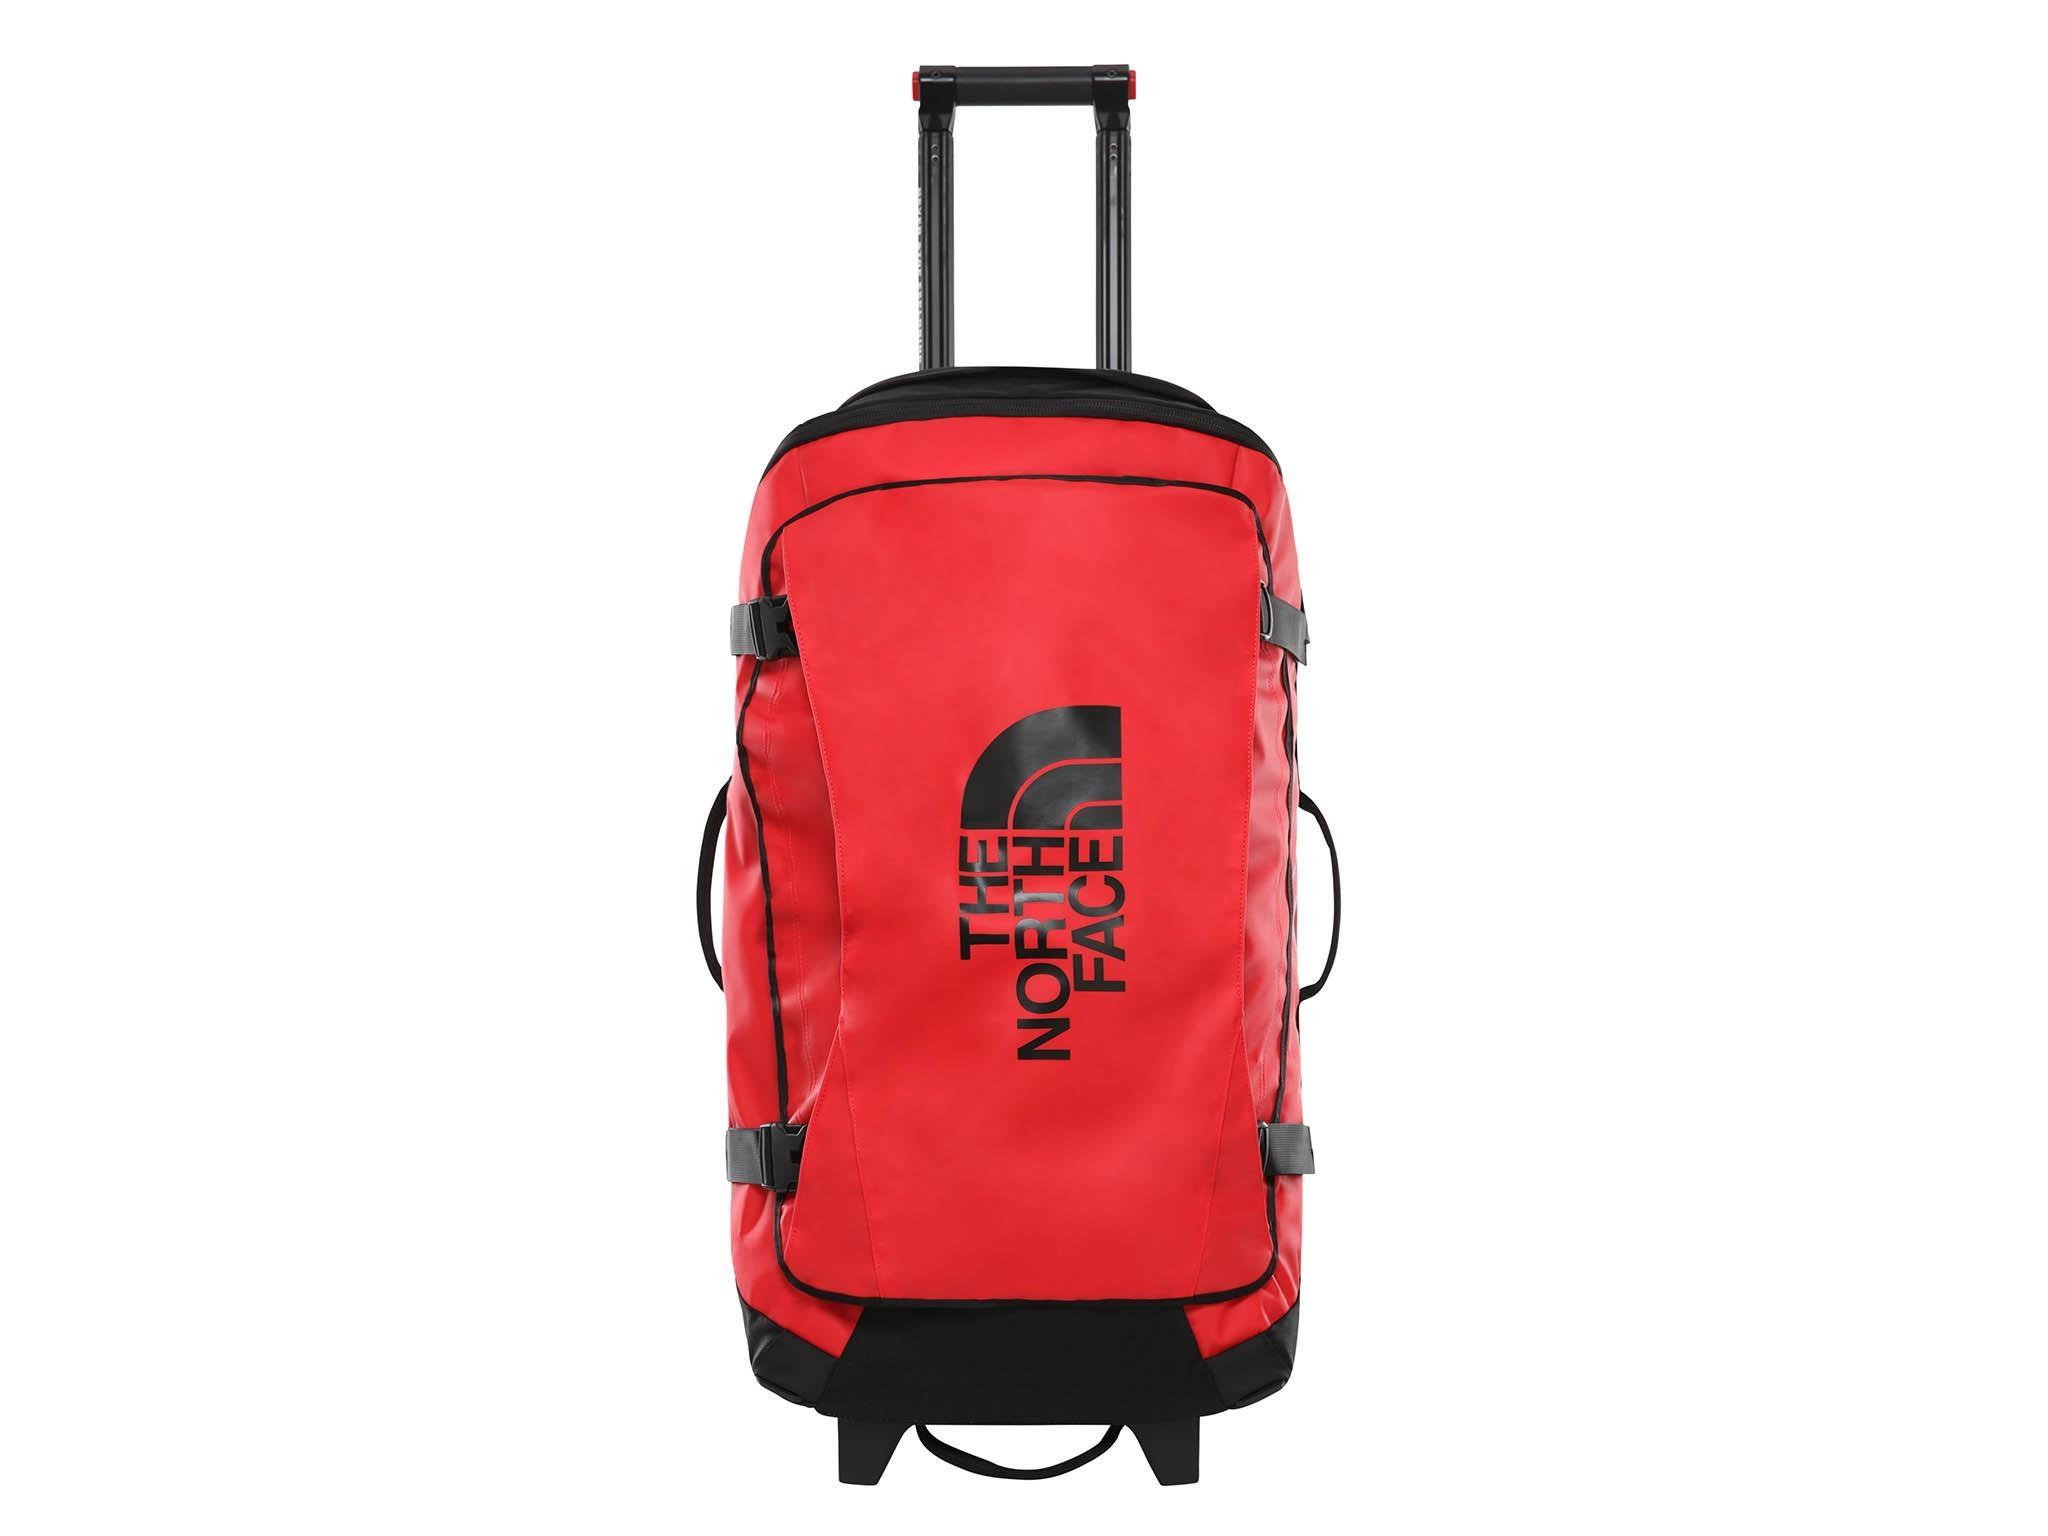 Eat Plants Love Animals Travel Bag Best Luggage Bags Duffle Bag Large Capacity Travel Organizer Bag